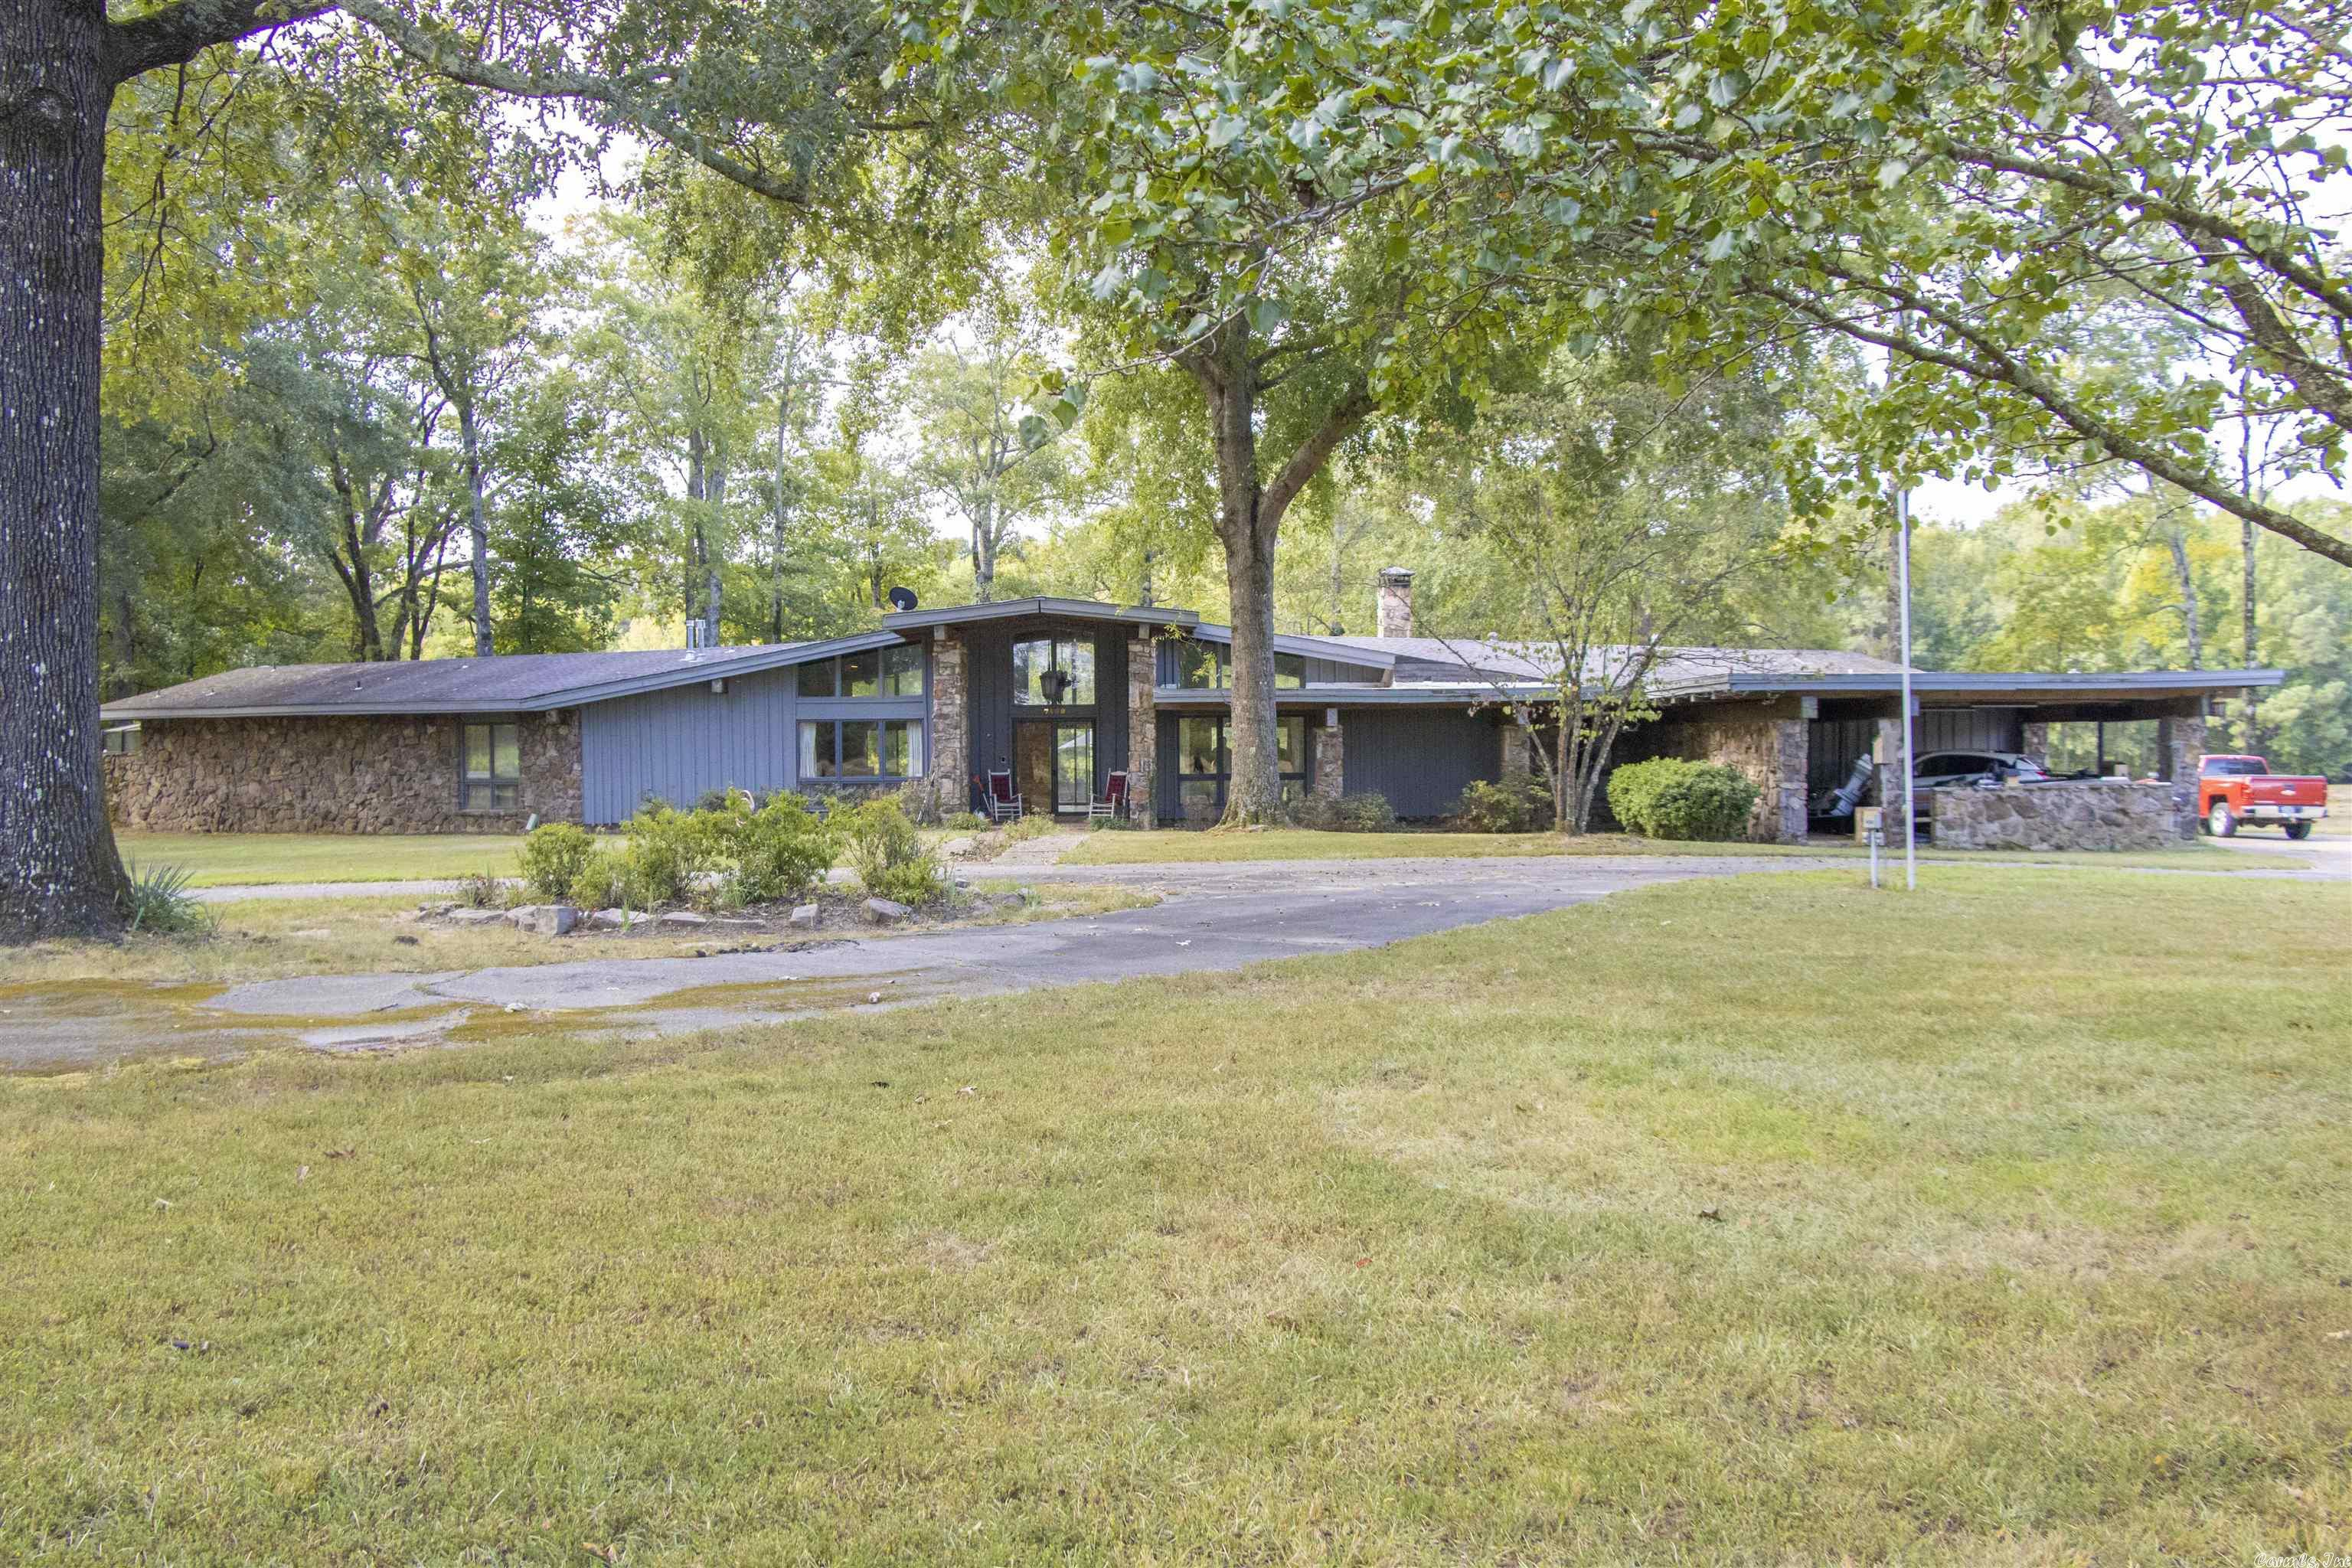 7409 Middle Warren Rd, Pine Bluff, AR 71603